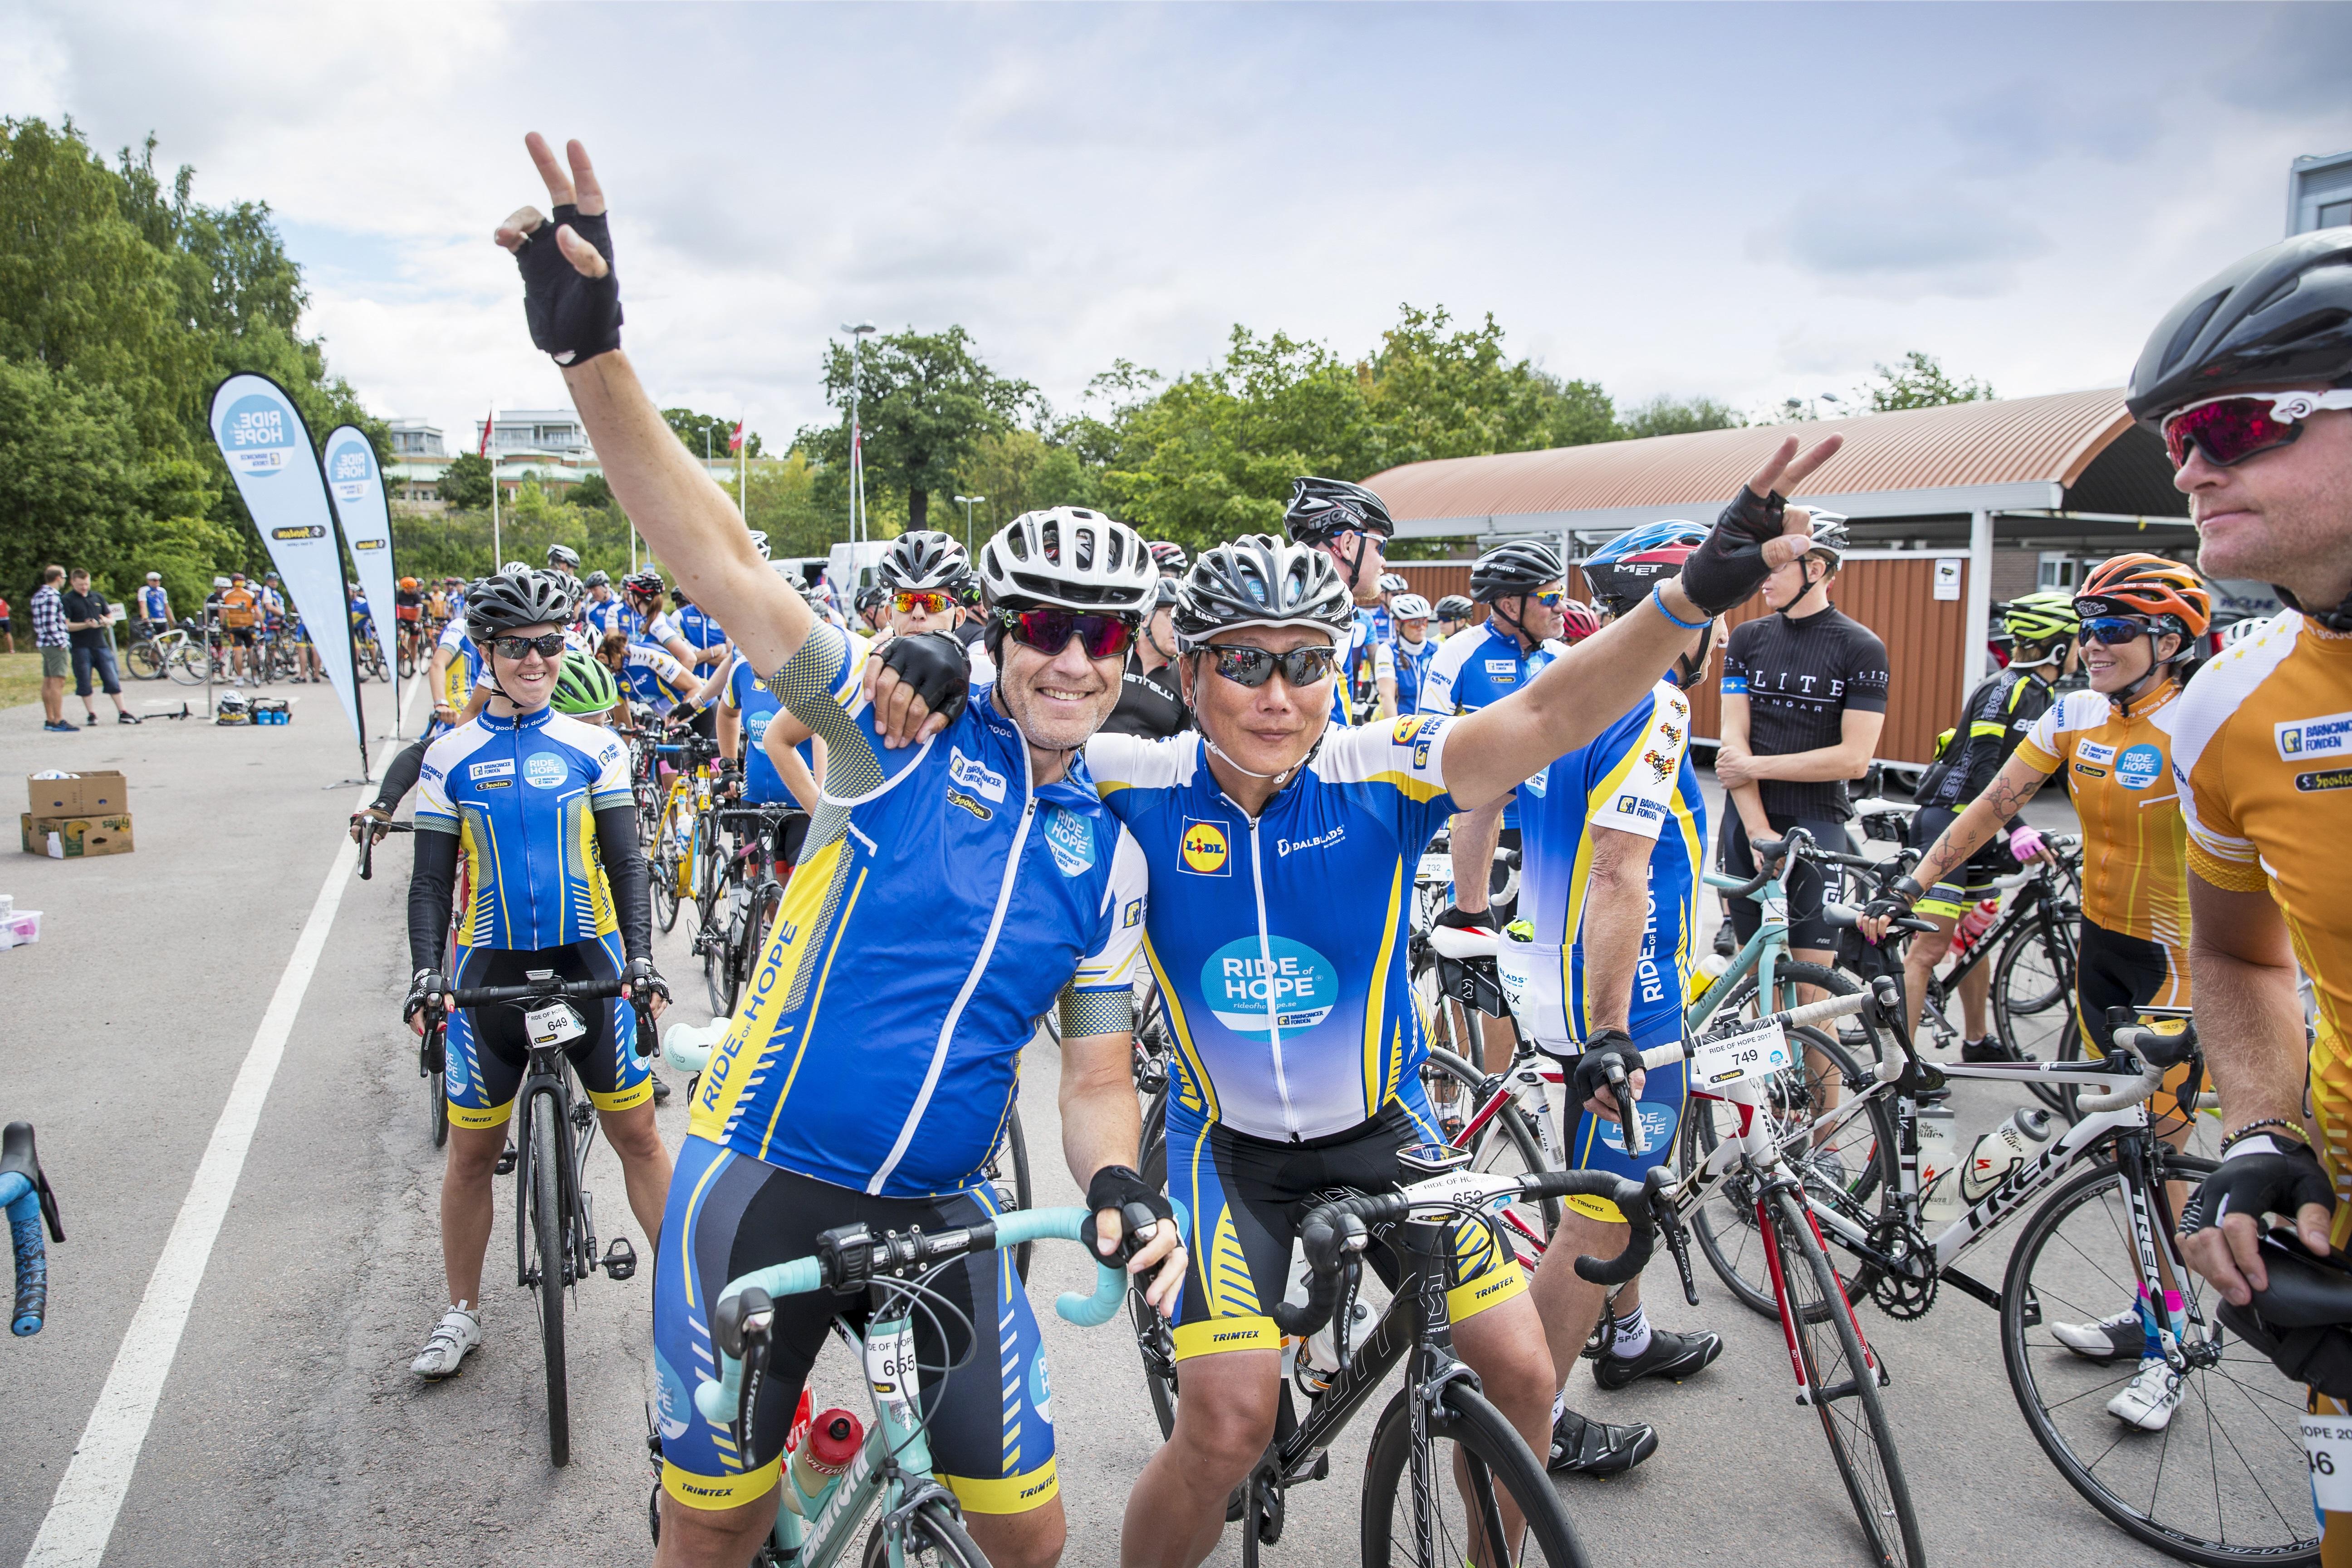 Glada deltagare i Barncancerfondens cykellopp Ride of Hope 2017. Foto: Magnus Glans